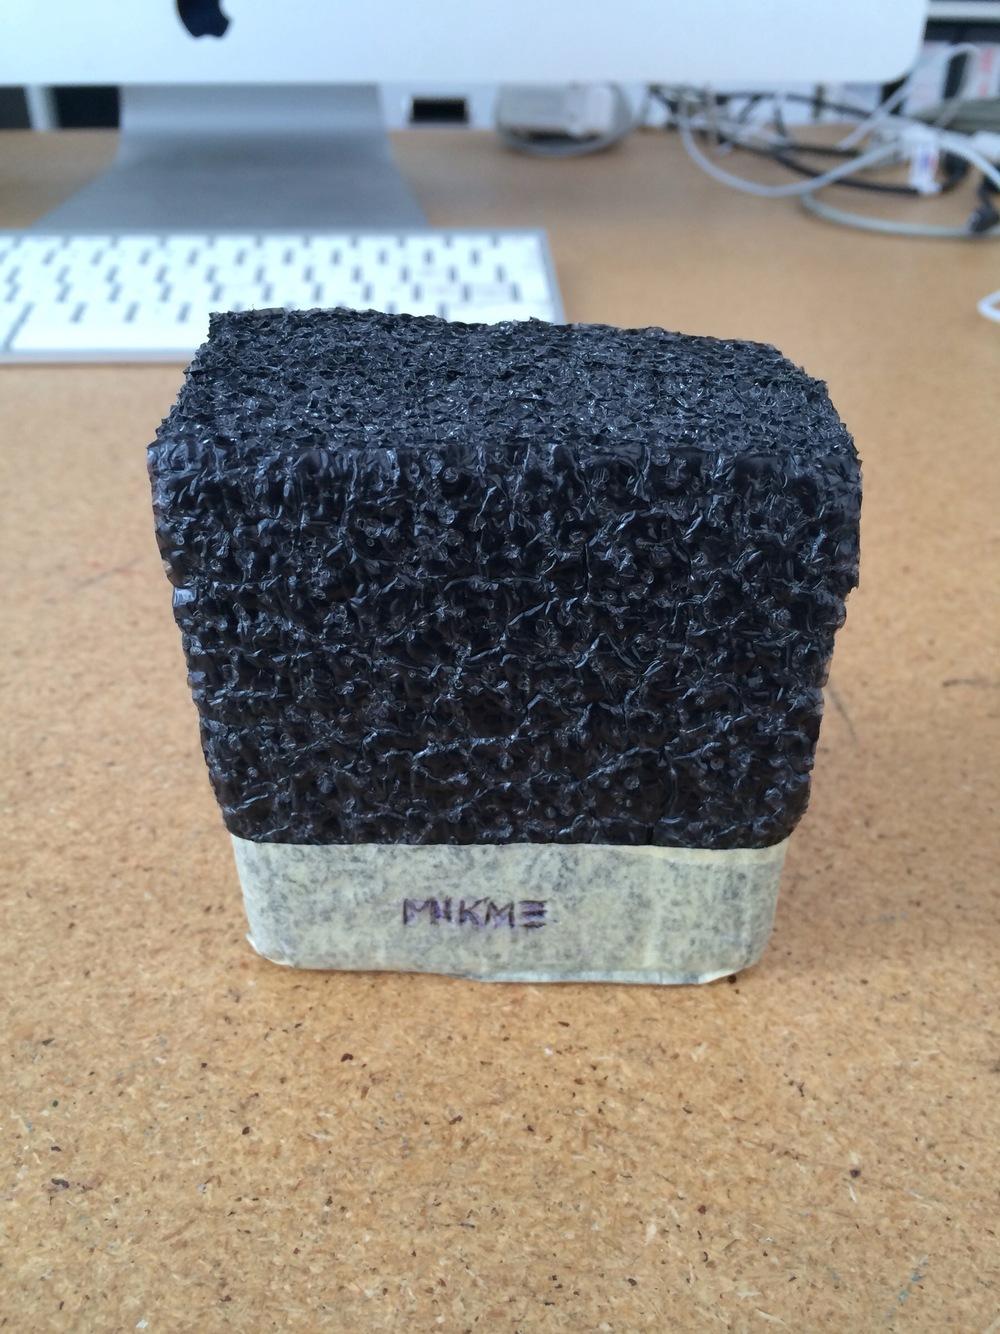 Mikme microphone - early foam prototype - with Philipp's Apple iMac